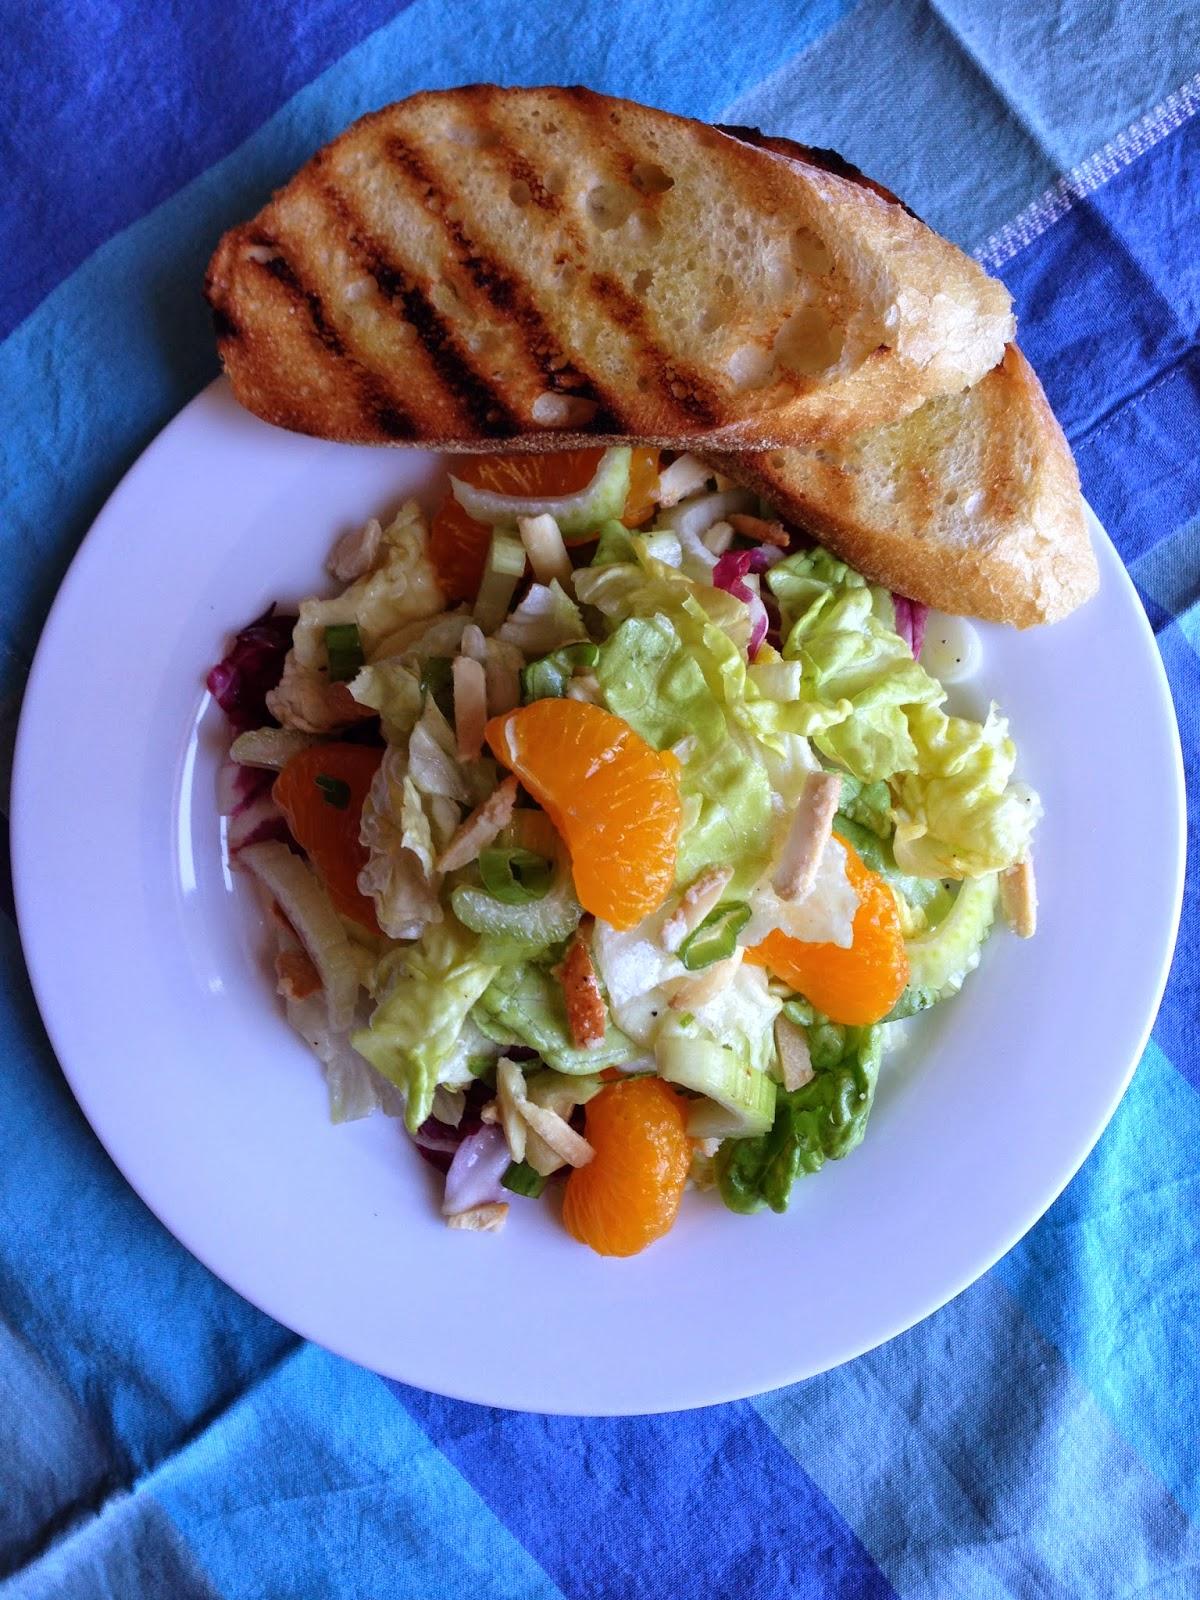 Mandarin Orange and Candied Almond Salad